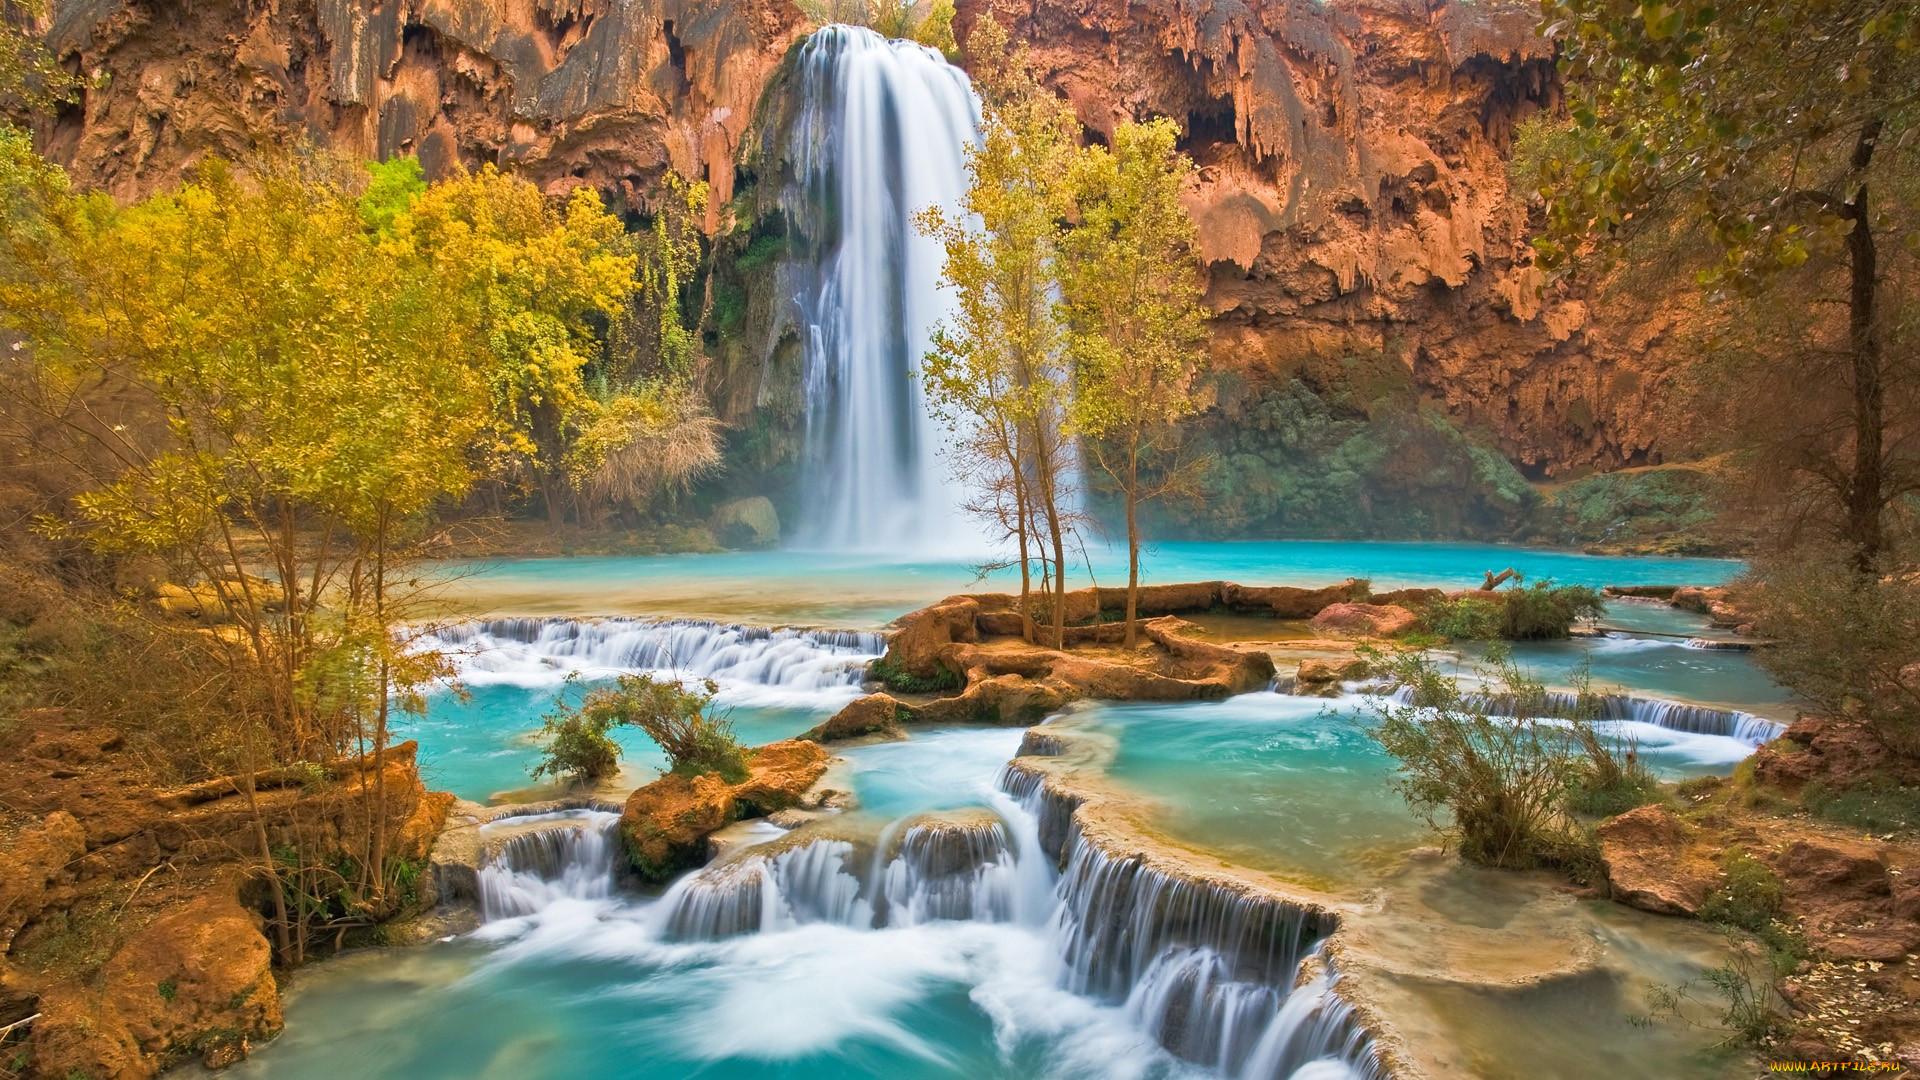 Картинки с водопадом и природой